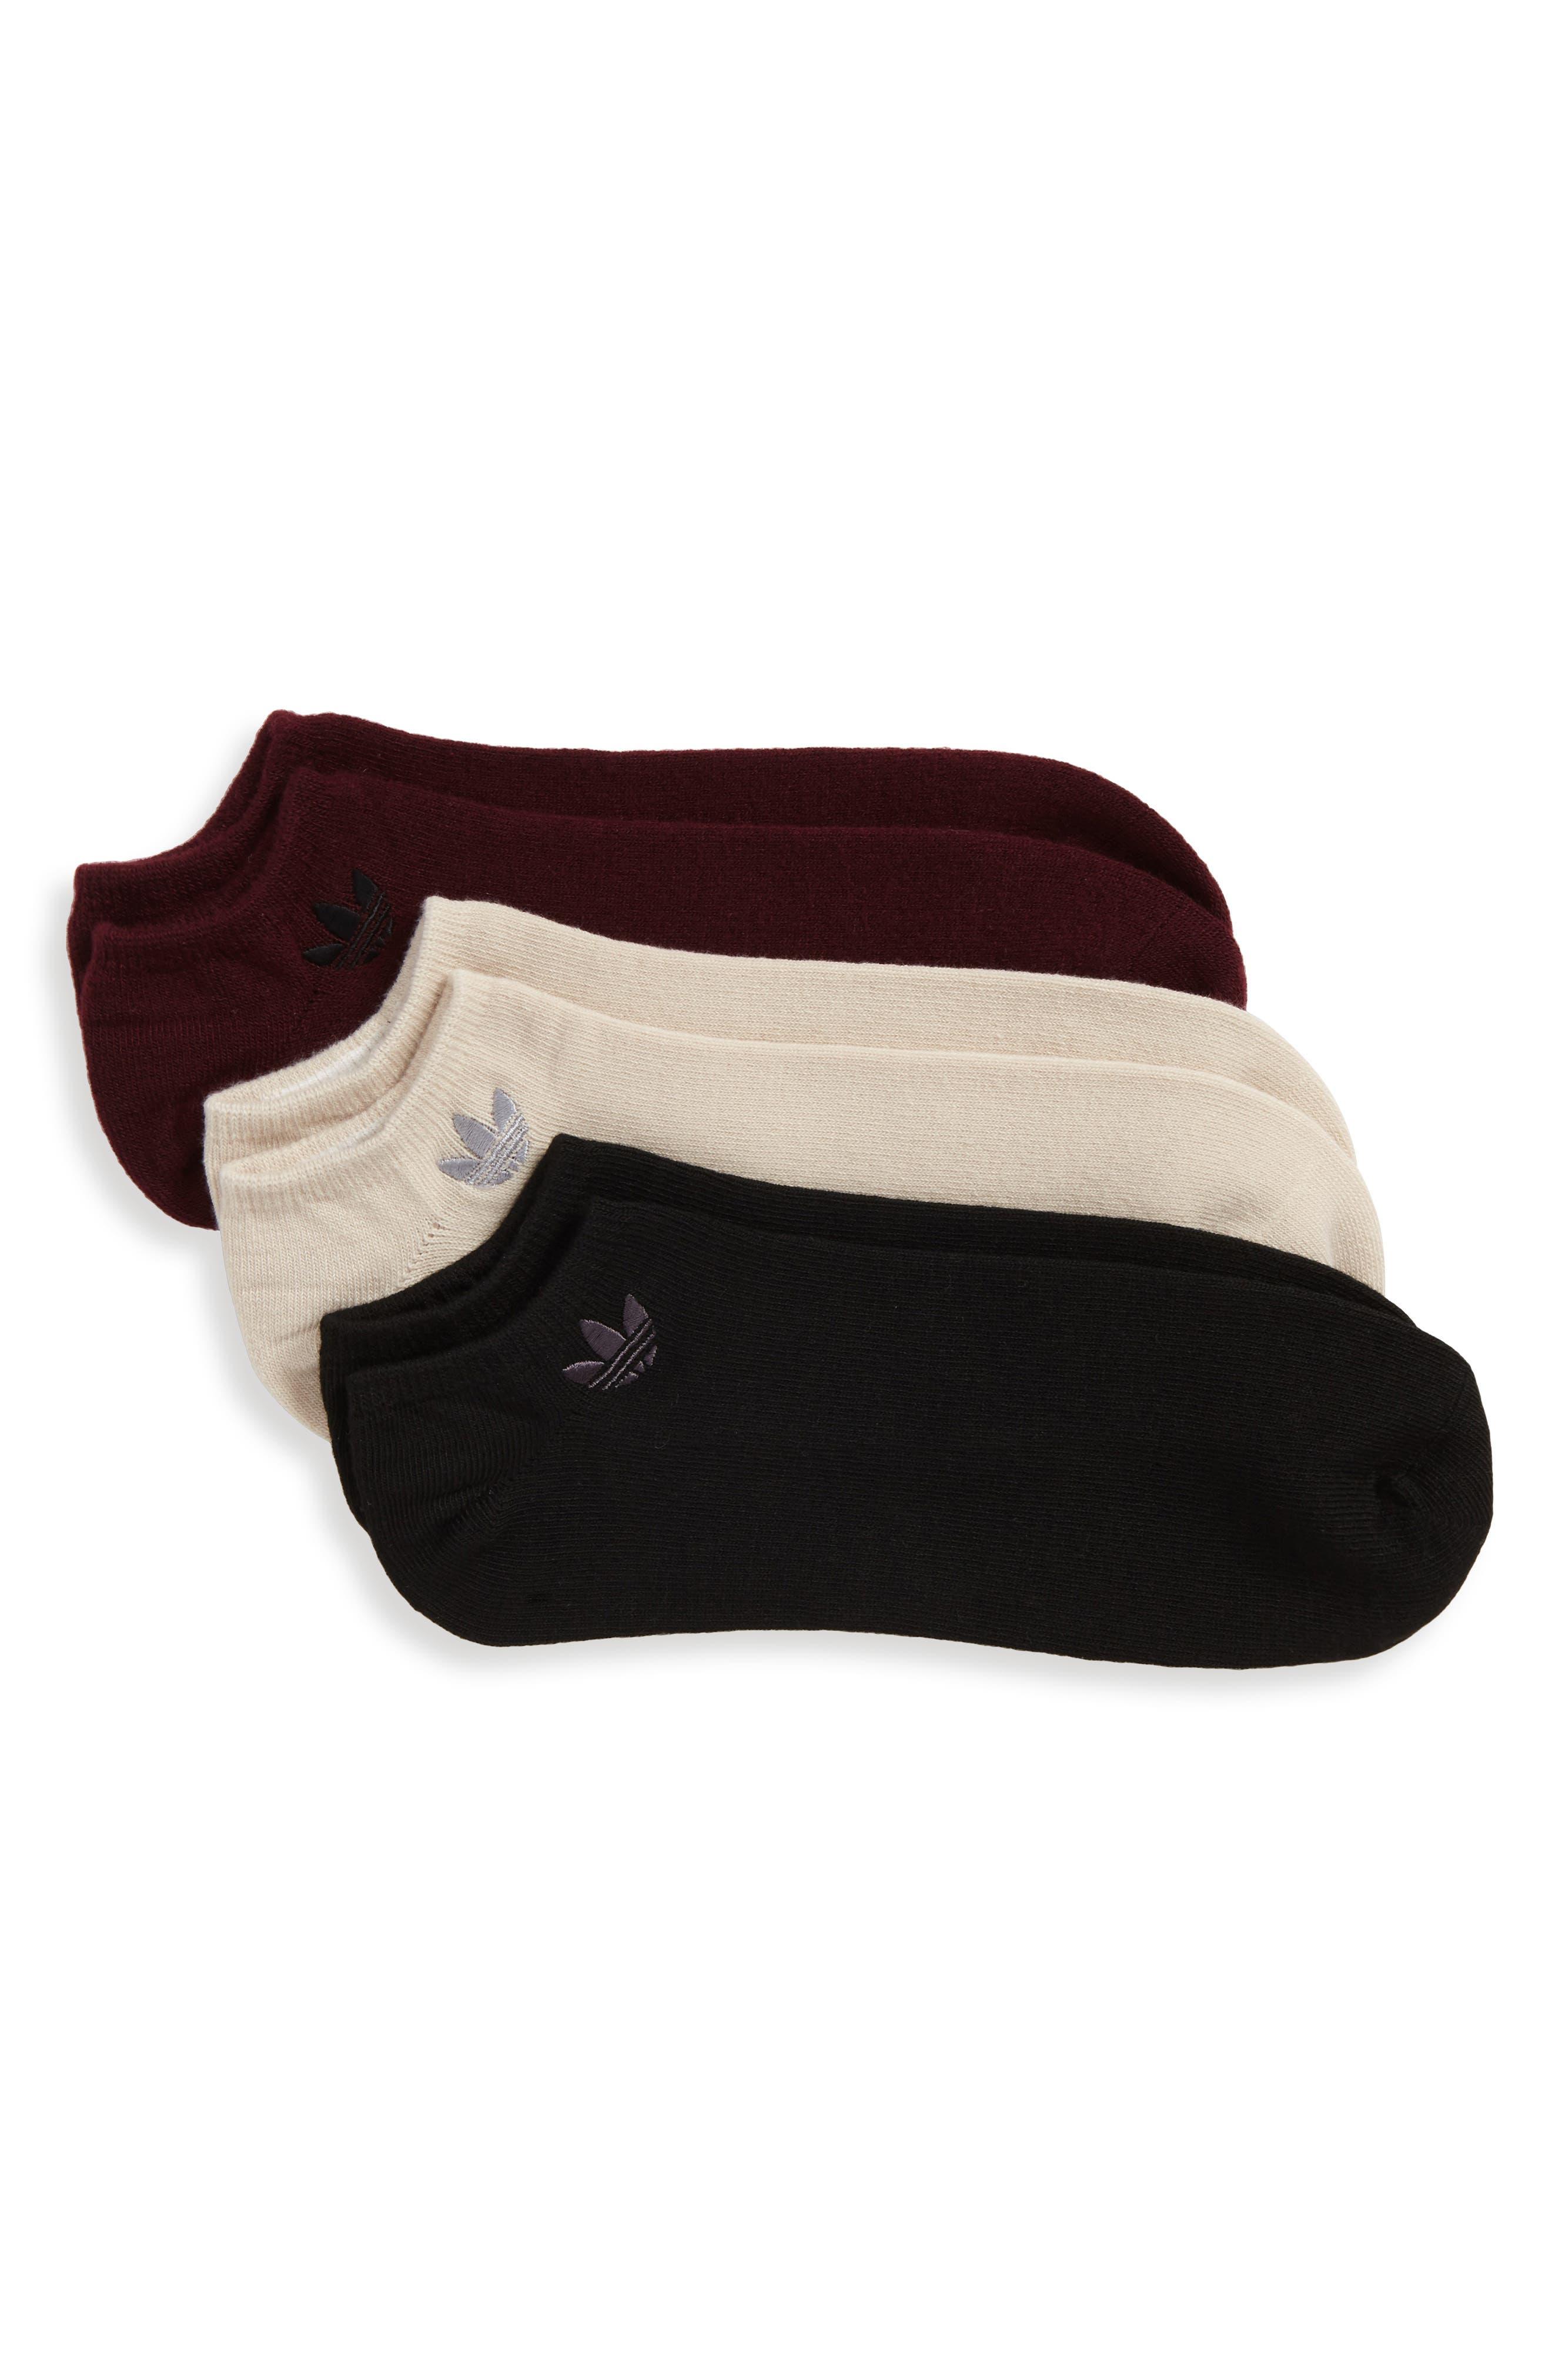 3-Pack No-Show Socks,                         Main,                         color, Black/ Brown/ Maroon